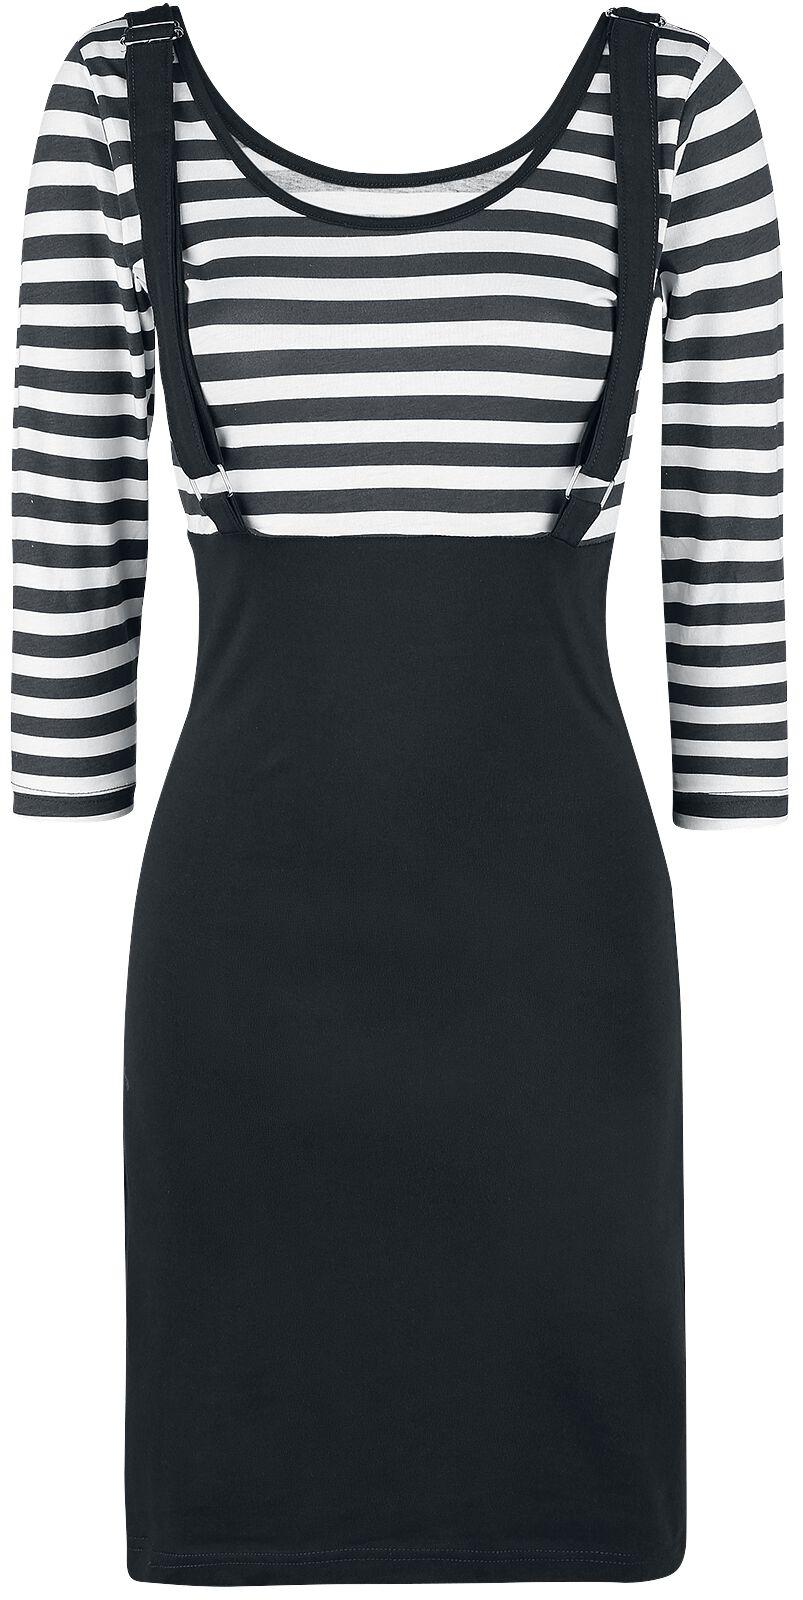 Marki - Sukienki - Sukienka Rockabella Compass Dress Sukienka czarny/biały - 370180